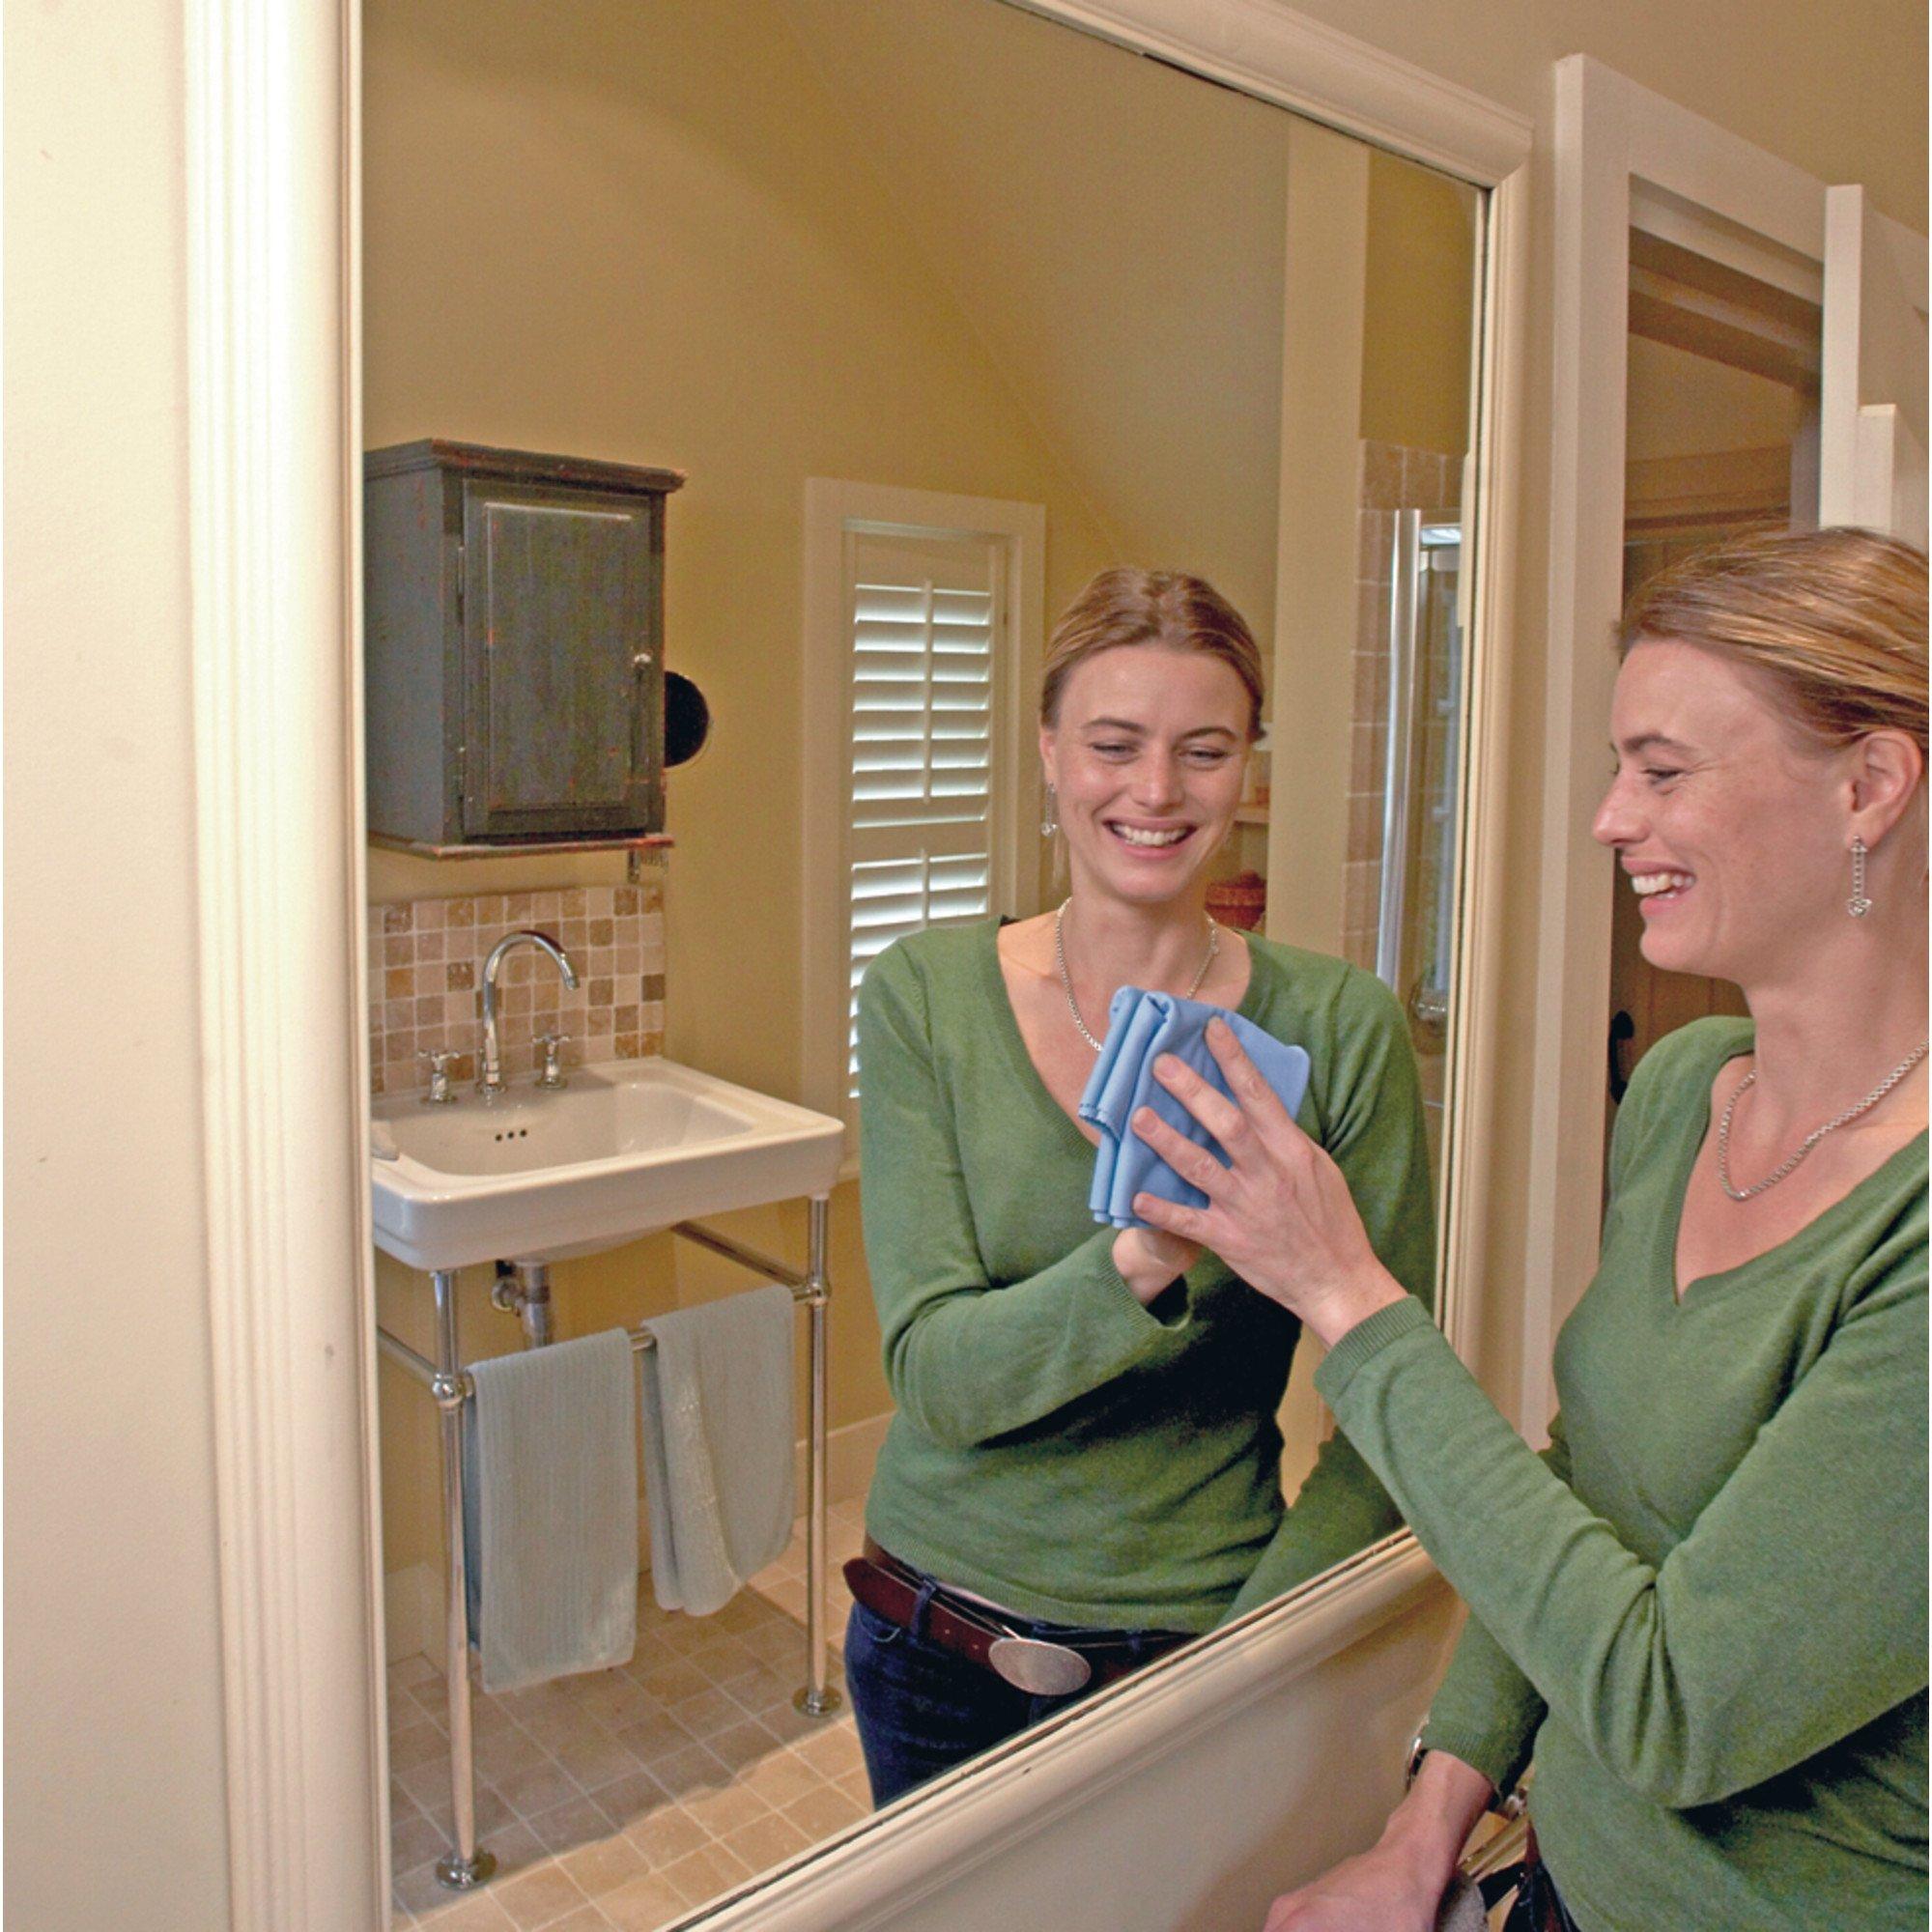 Glass & Polishing Cloth - Brilliant for Sparkling Windows, Mirrors, Glassware, Chrome, and More by E-Cloth (Image #22)